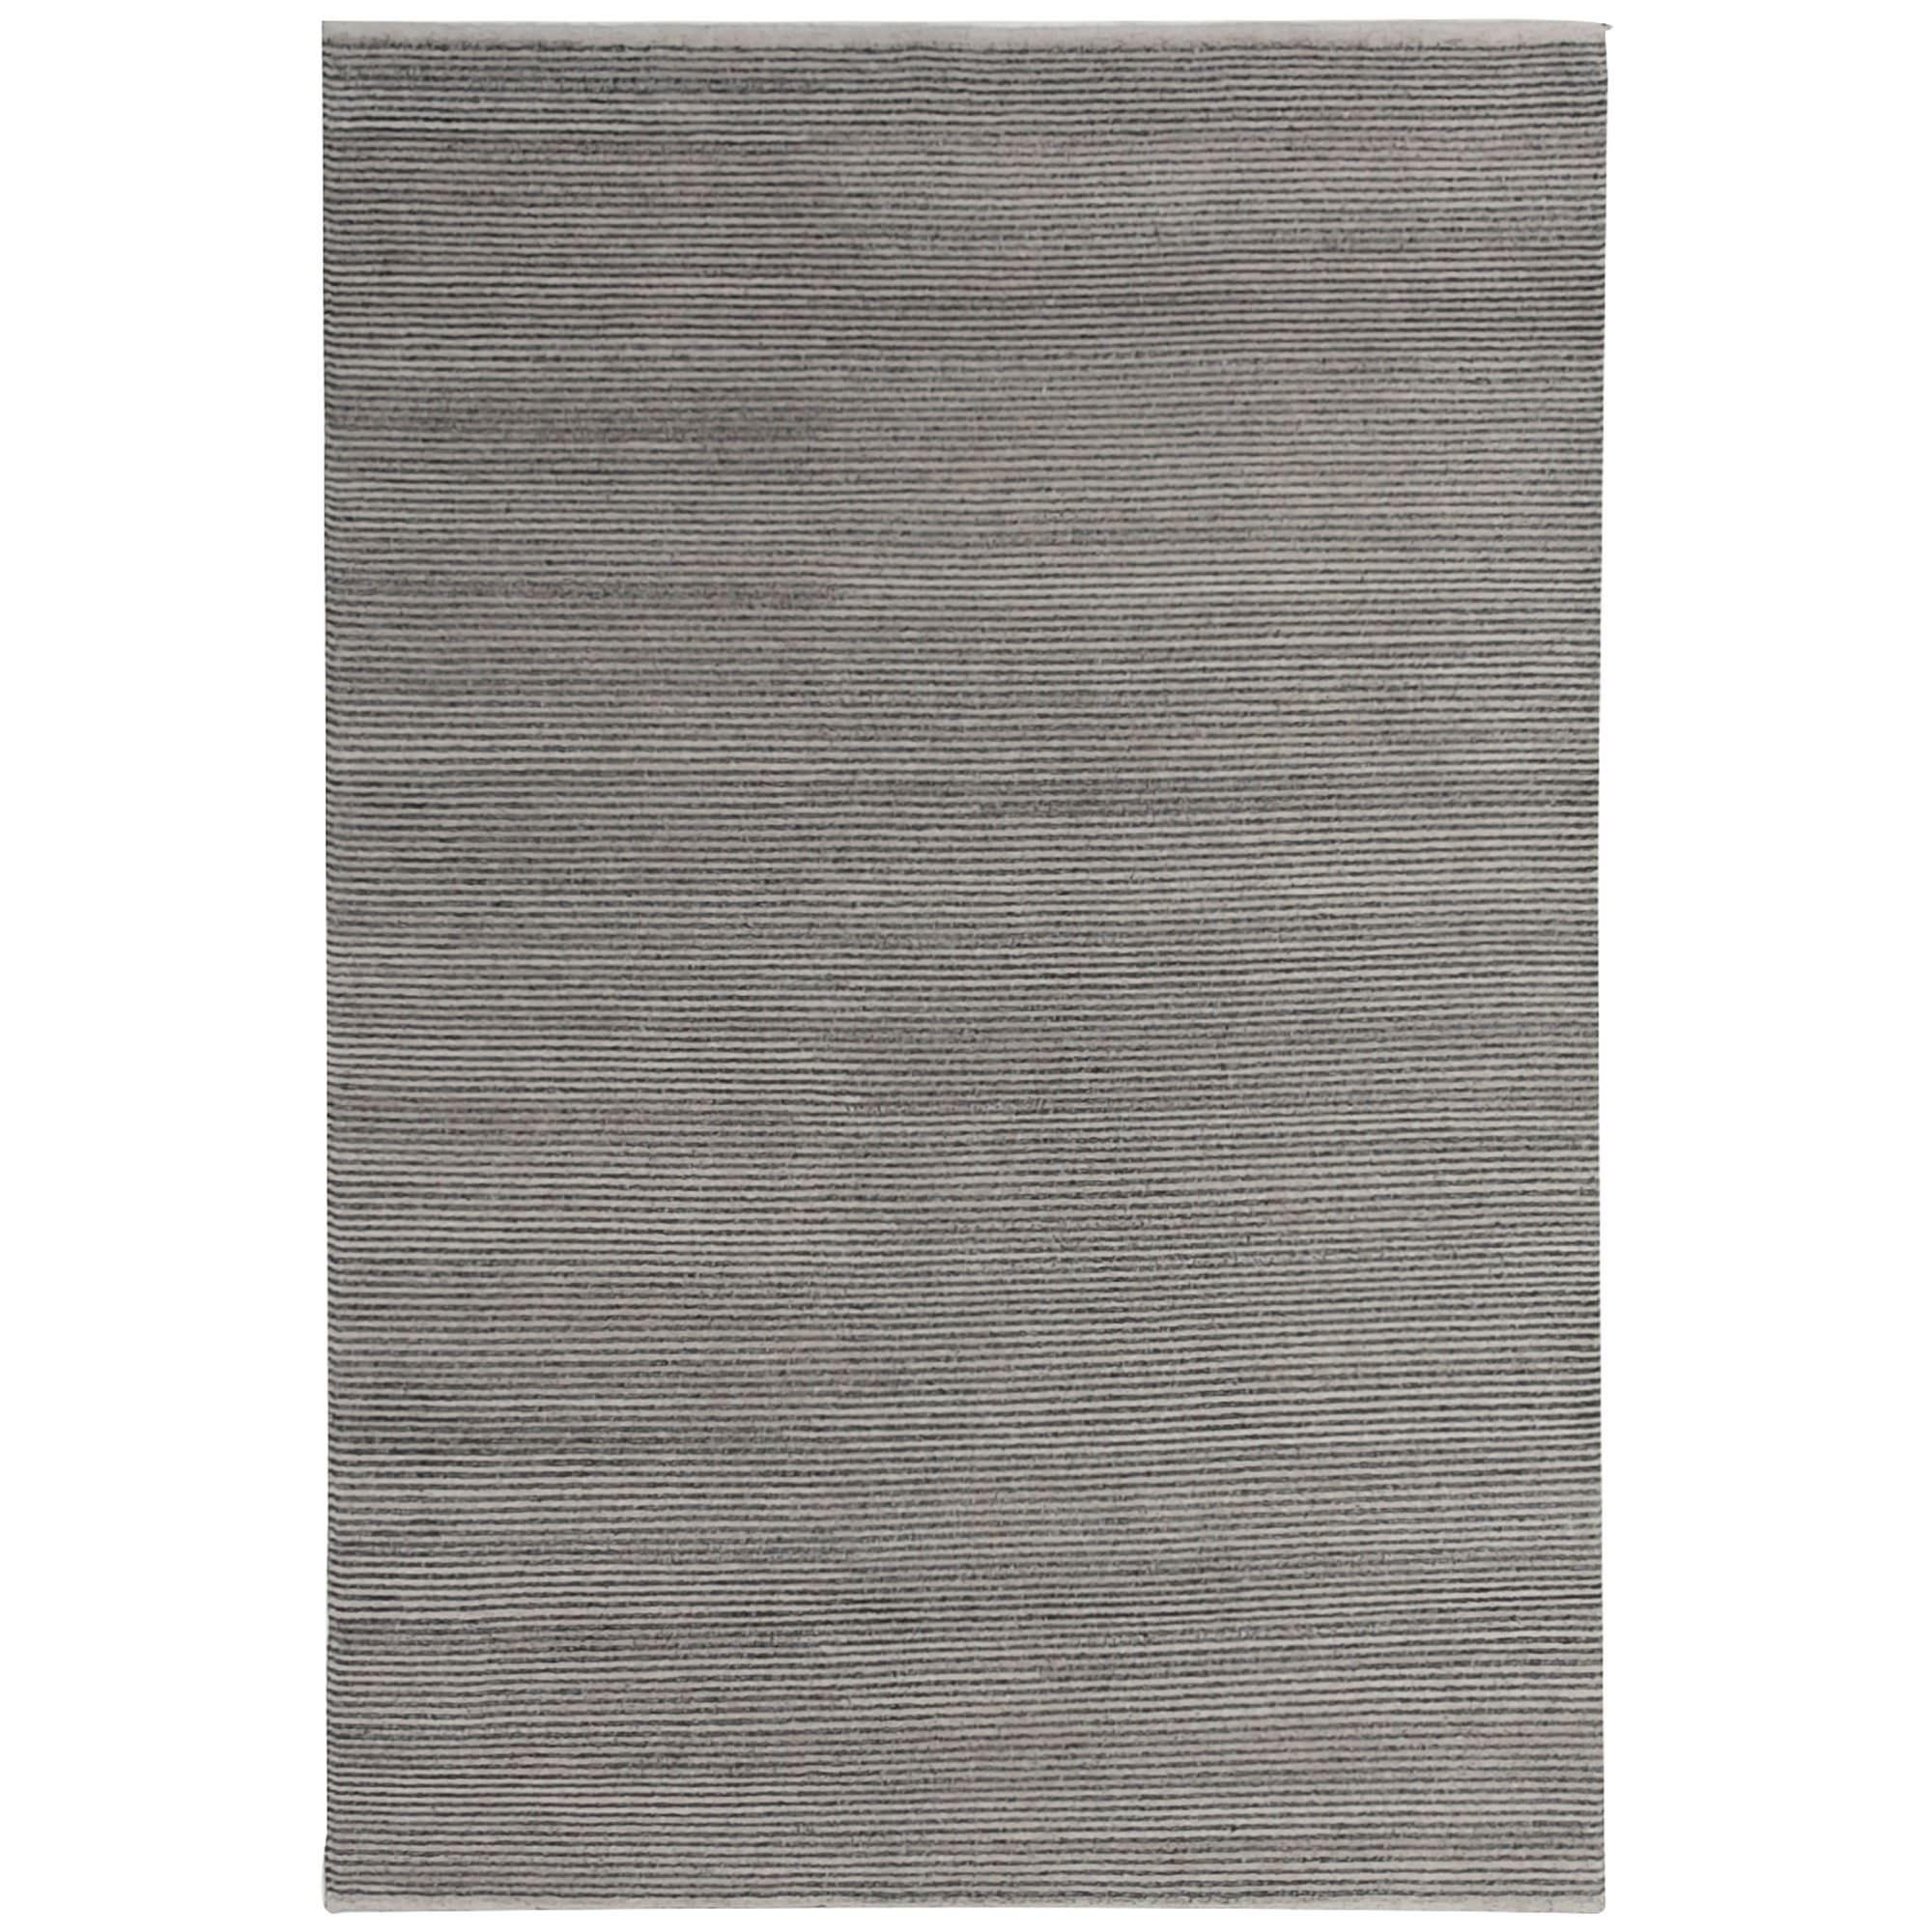 Boheme Hand Tufted Wool Rug, 350x450cm, Steel